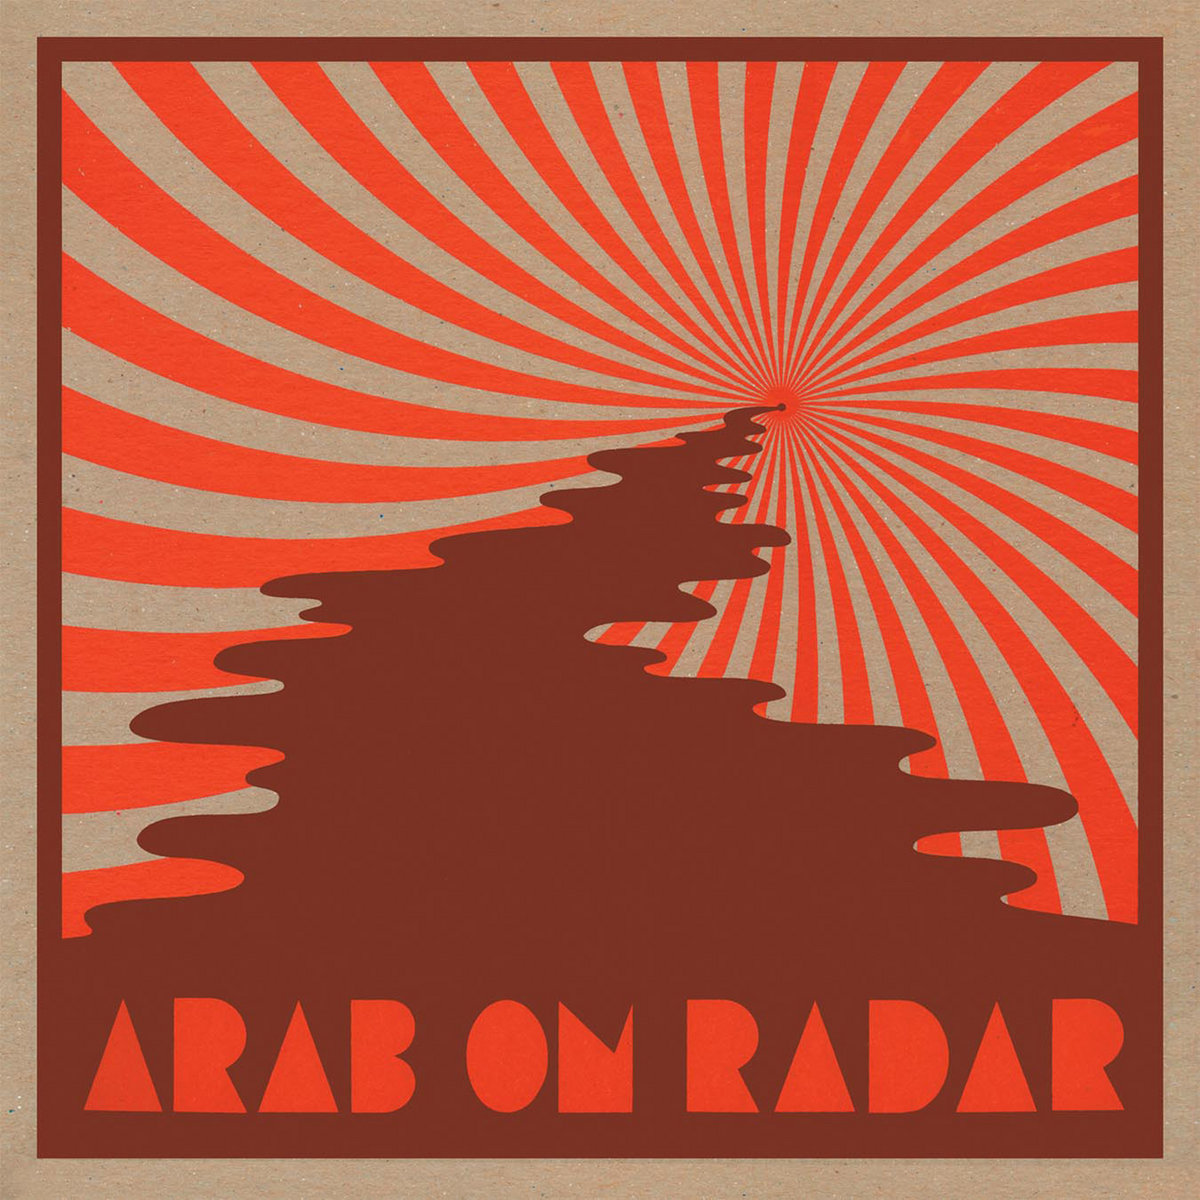 Soak The Saddle | Arab On Radar | SKiN GRAFT Records